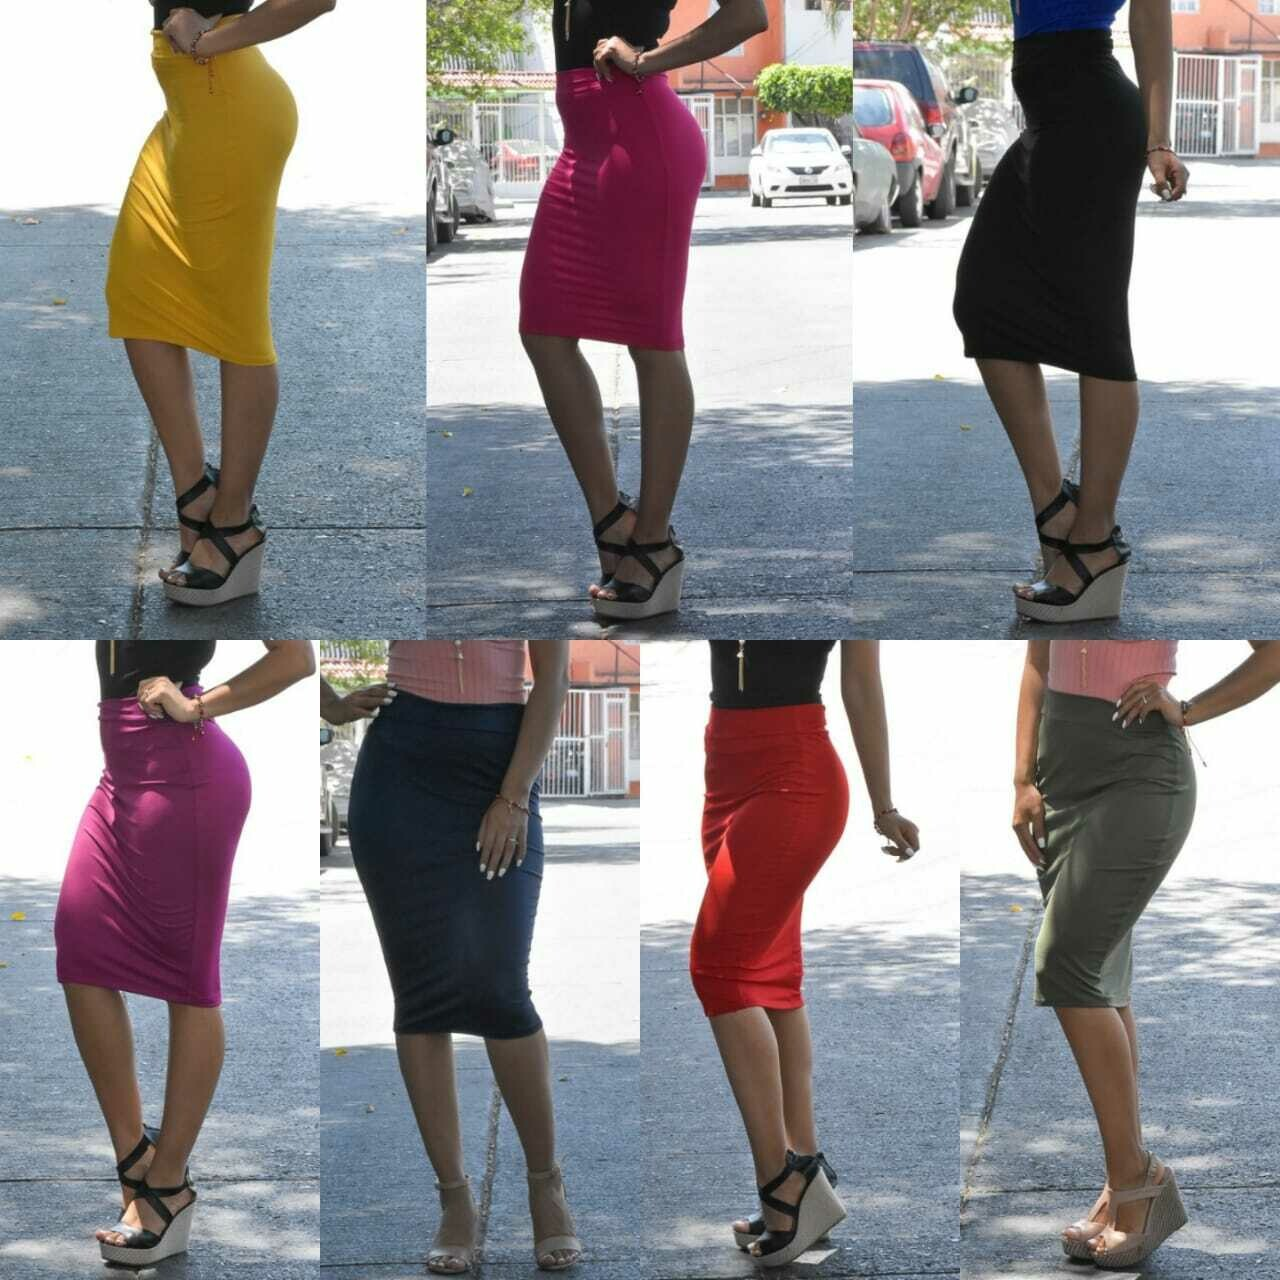 Paquete de 6 faldas corte lapiz modelo 207